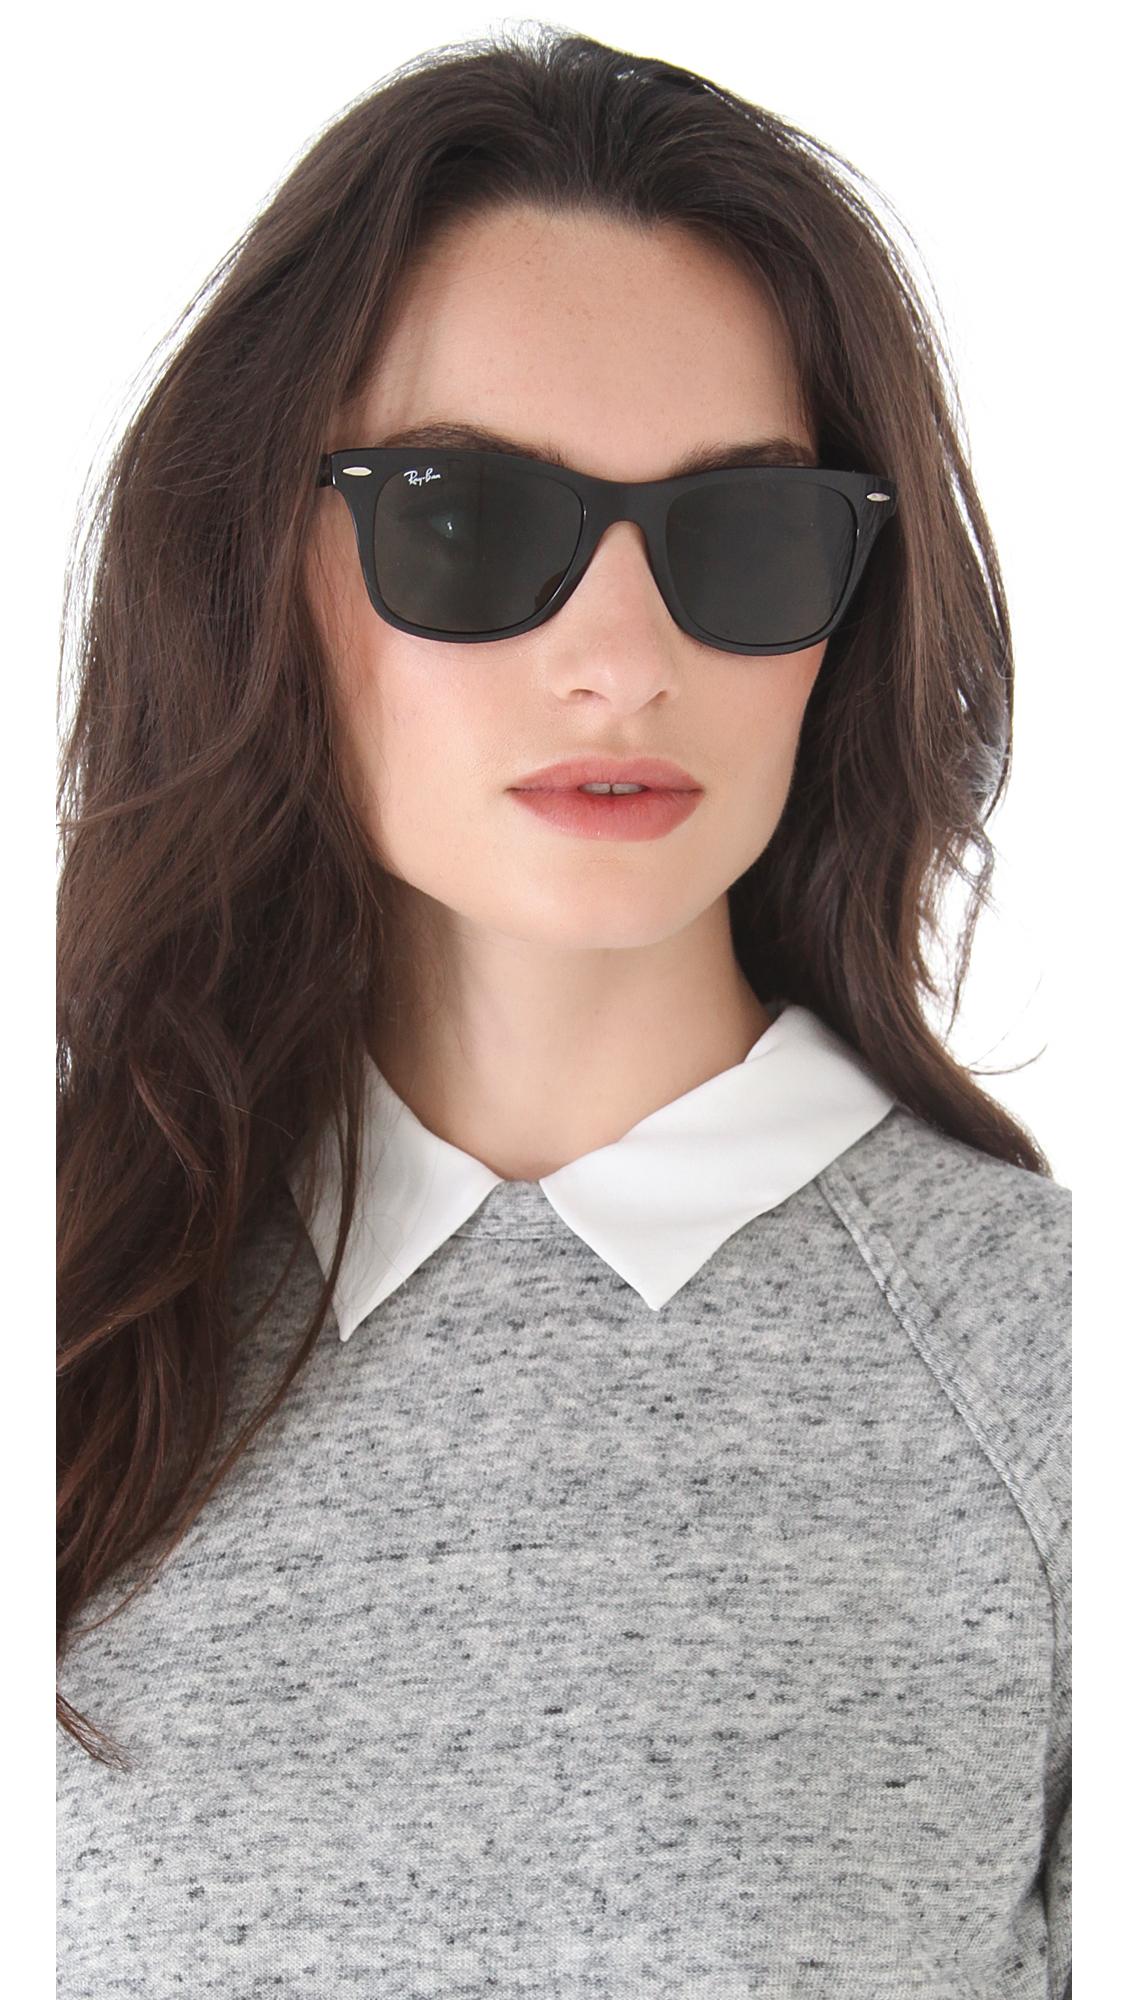 ray ban wayfarer sunglasses review